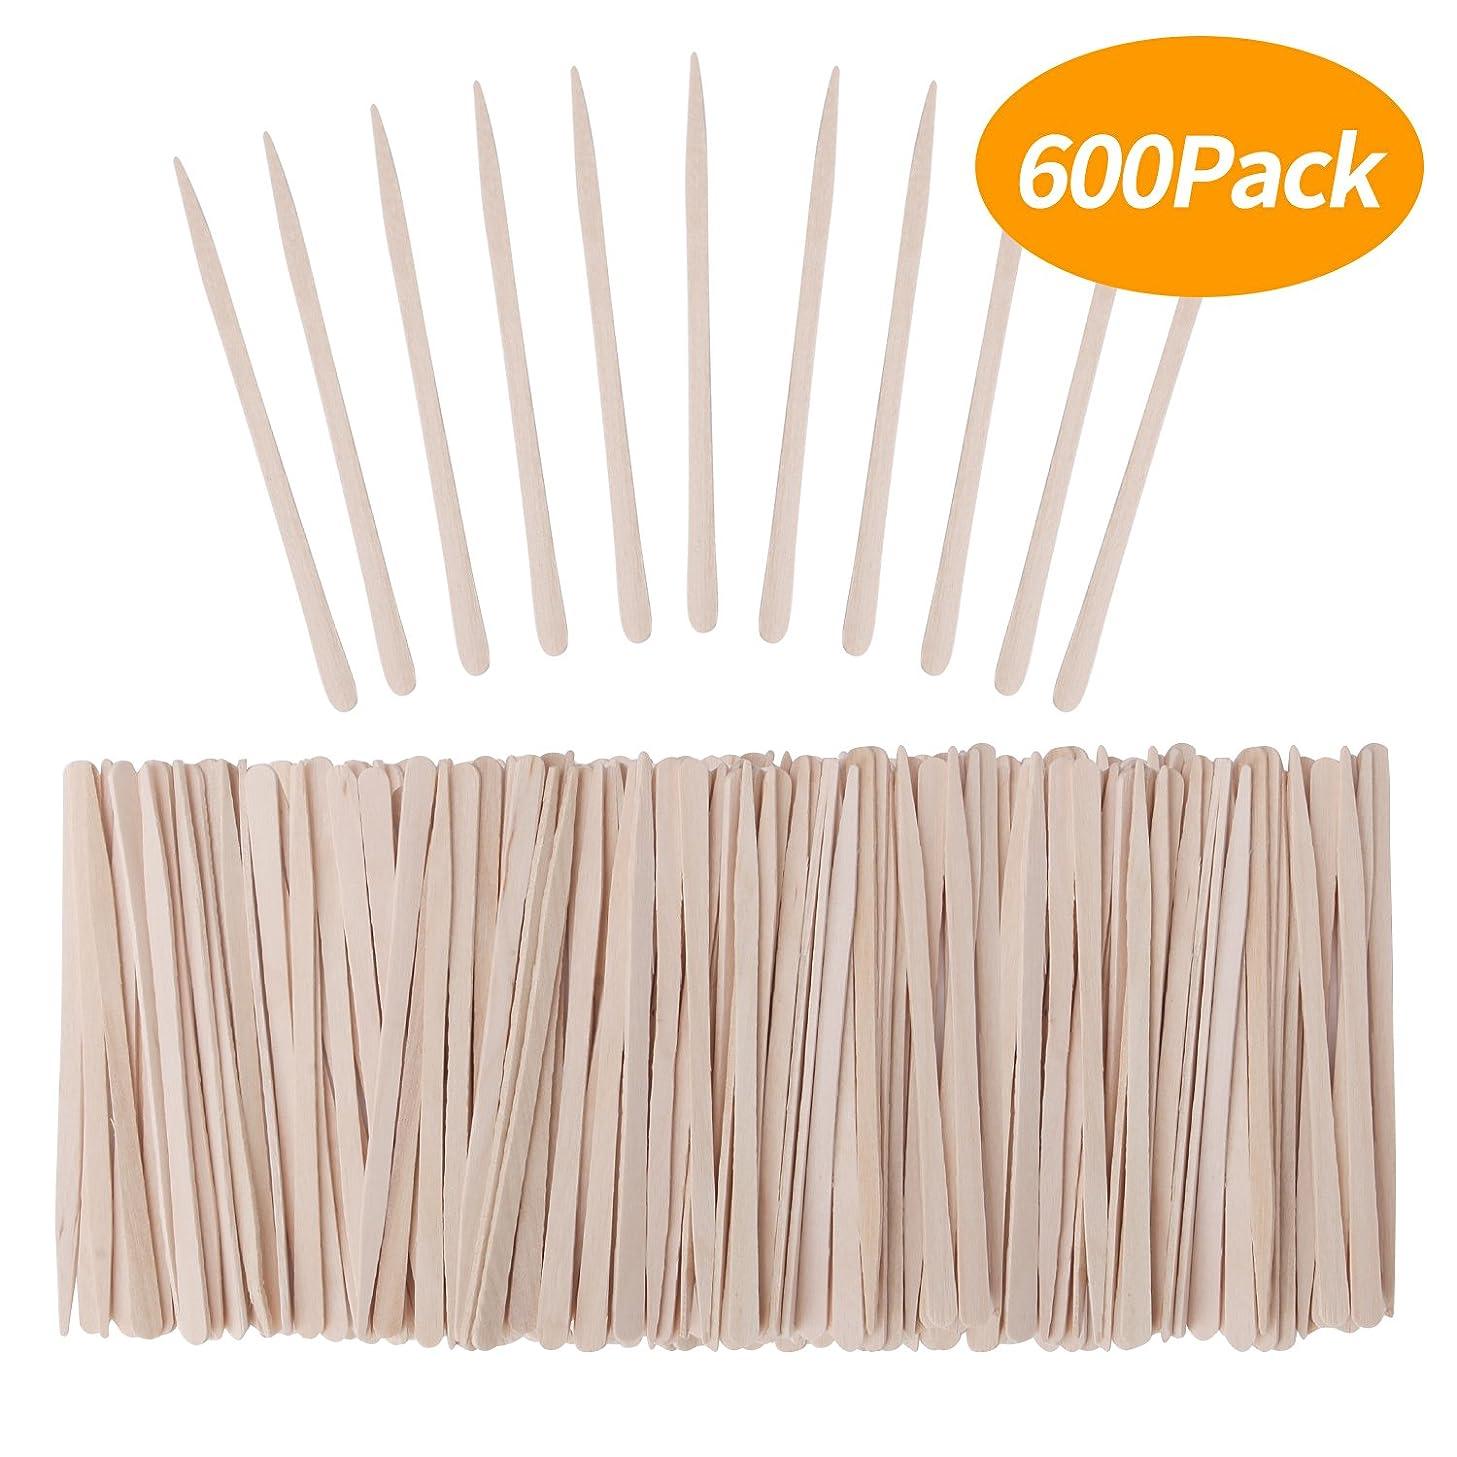 Senkary 600 Pieces Wooden Waxing Sticks Small Wax Sticks Wax Applicator Sticks Wood Wax Spatulas Sticks for Hair Eyebrow Nose Removal (Without Handle)